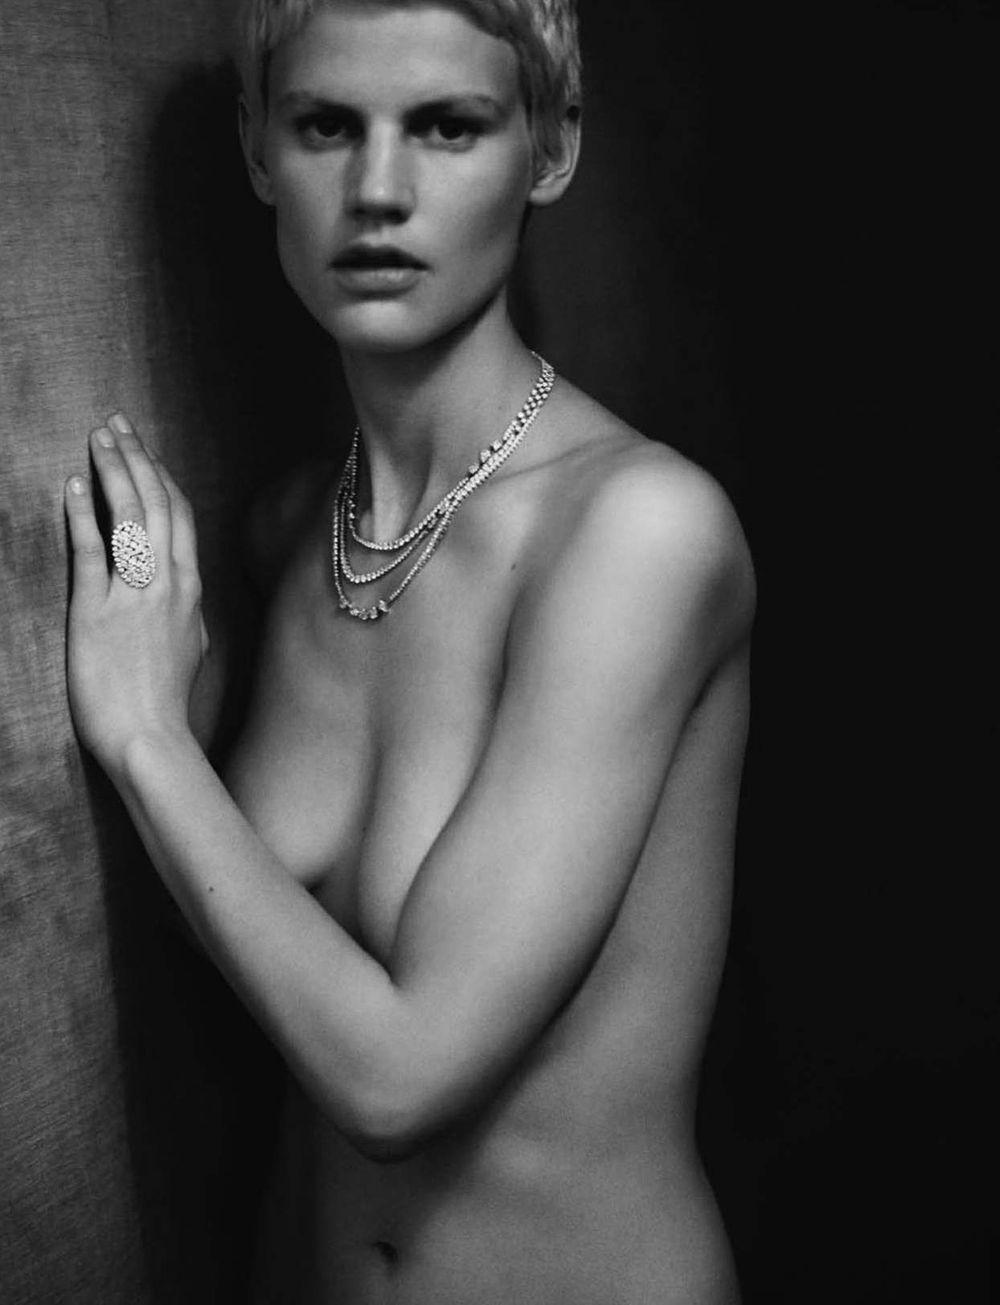 Saskia de Brauw Topless nudes (25 photos), Paparazzi Celebrity images